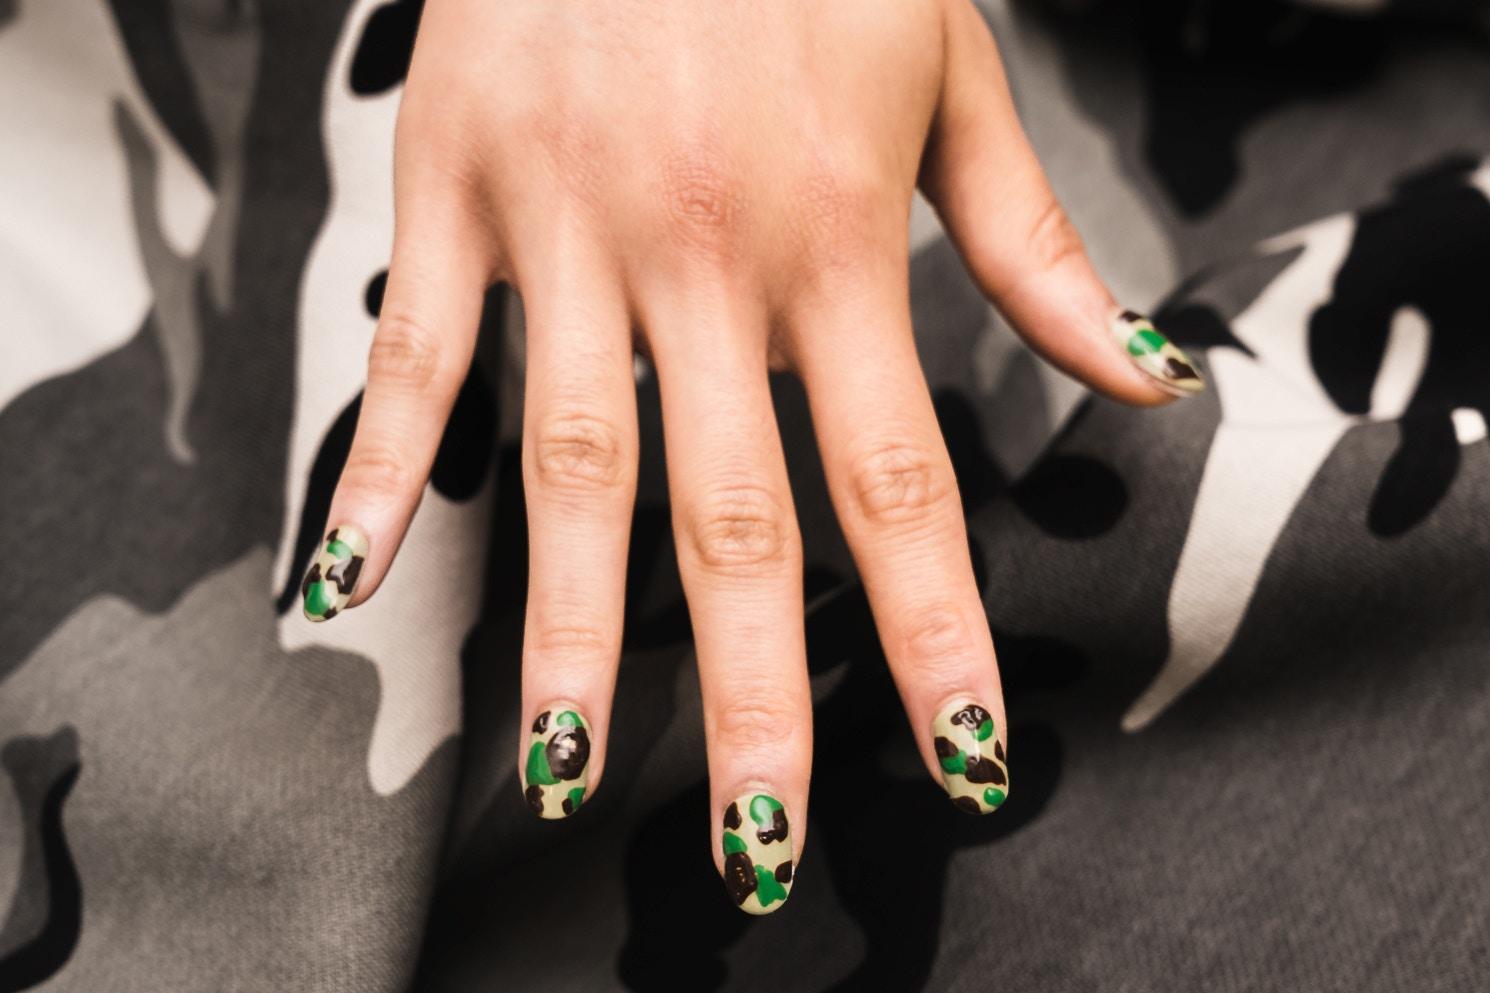 BAPE Inspired Nails